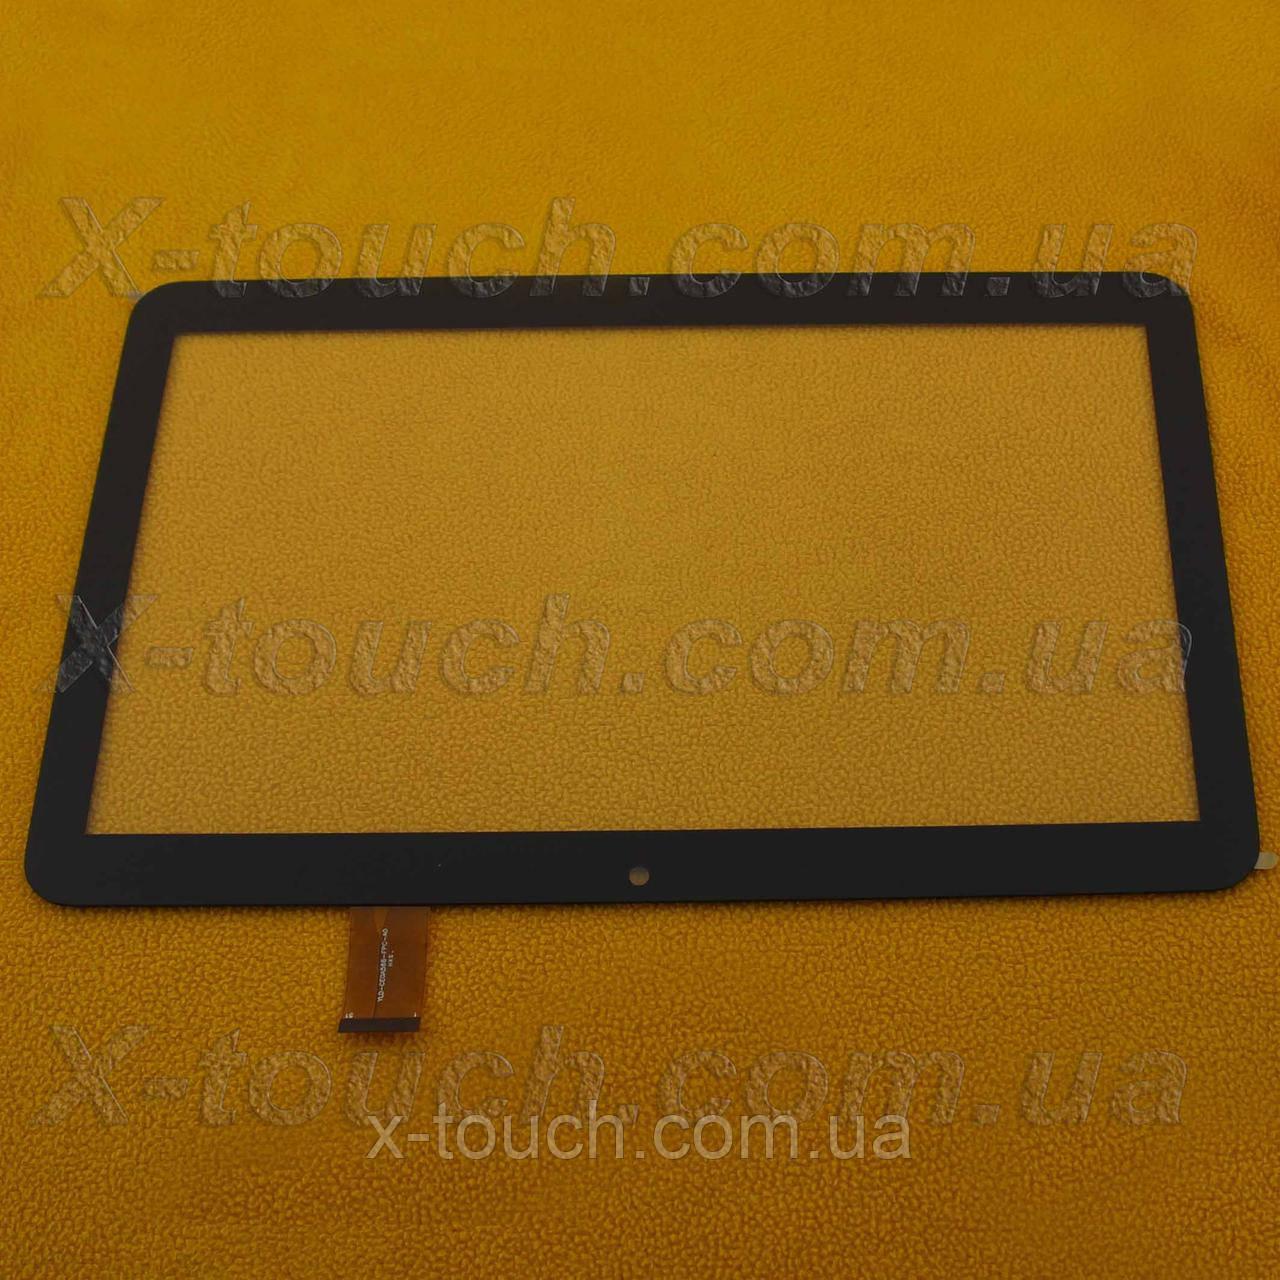 Тачскрін, сенсор SQ-PGA1072-FPC-A0 для планшета